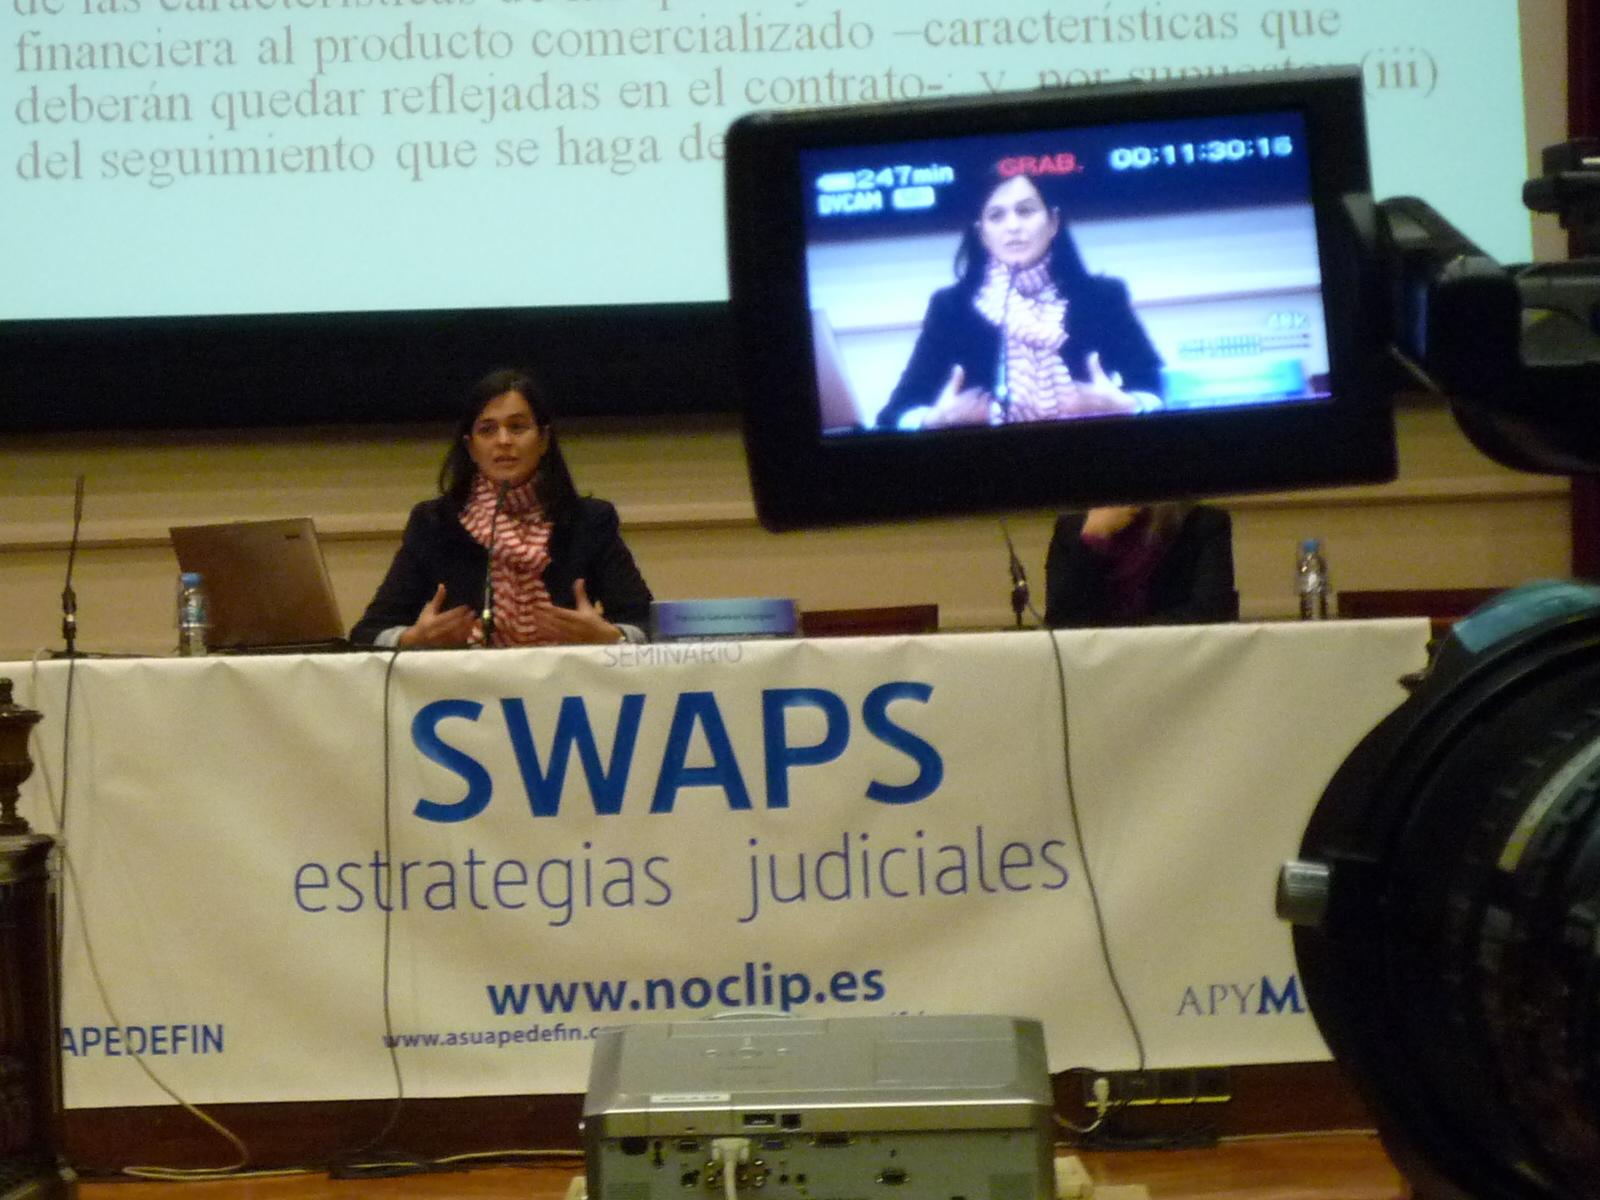 3. Demandas de nulidad. Patricia Gabeiras Vázquez